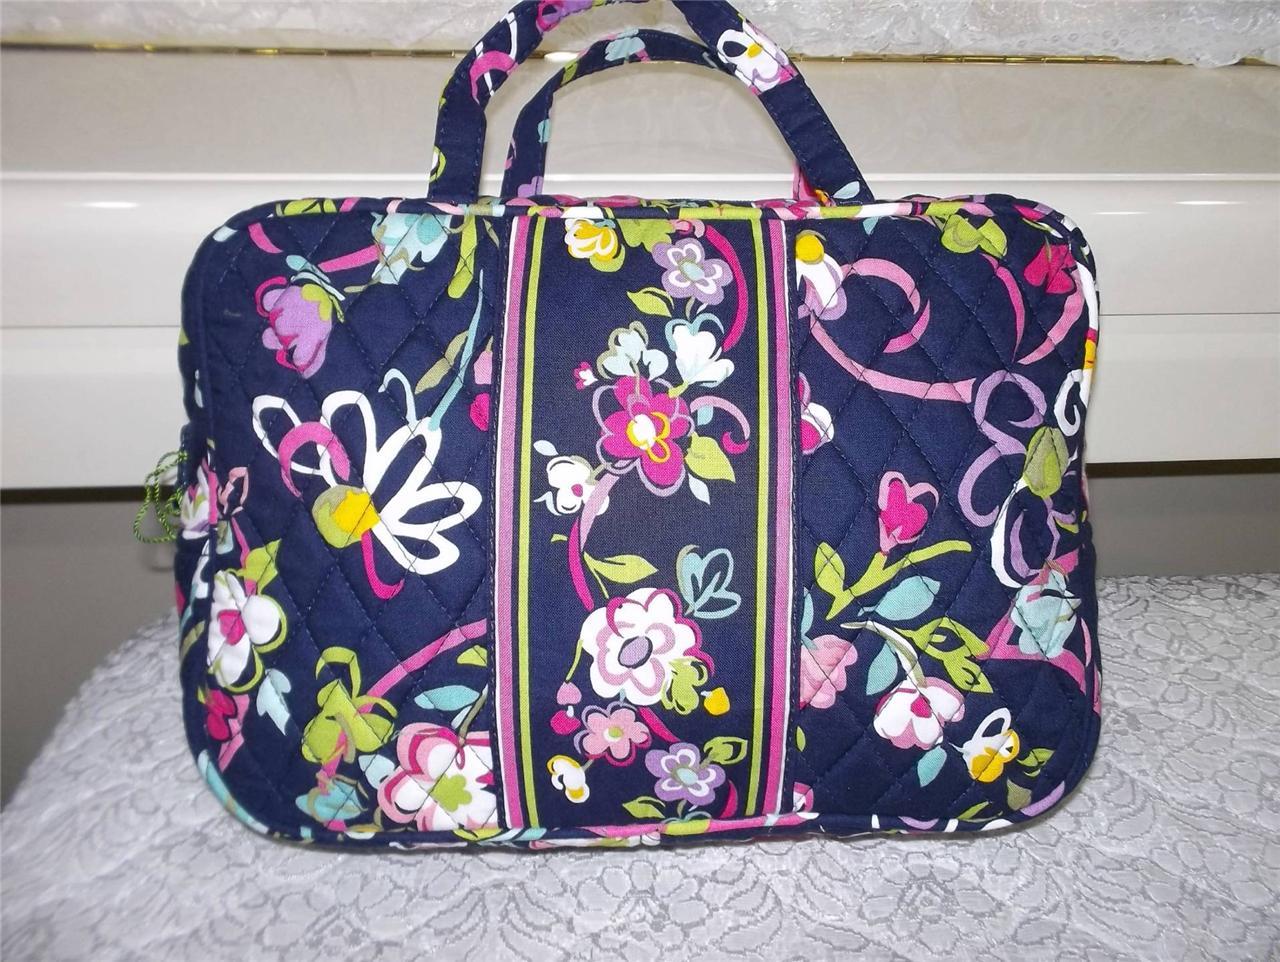 nwt new vera bradley grand cosmetic bag in 8 patterns